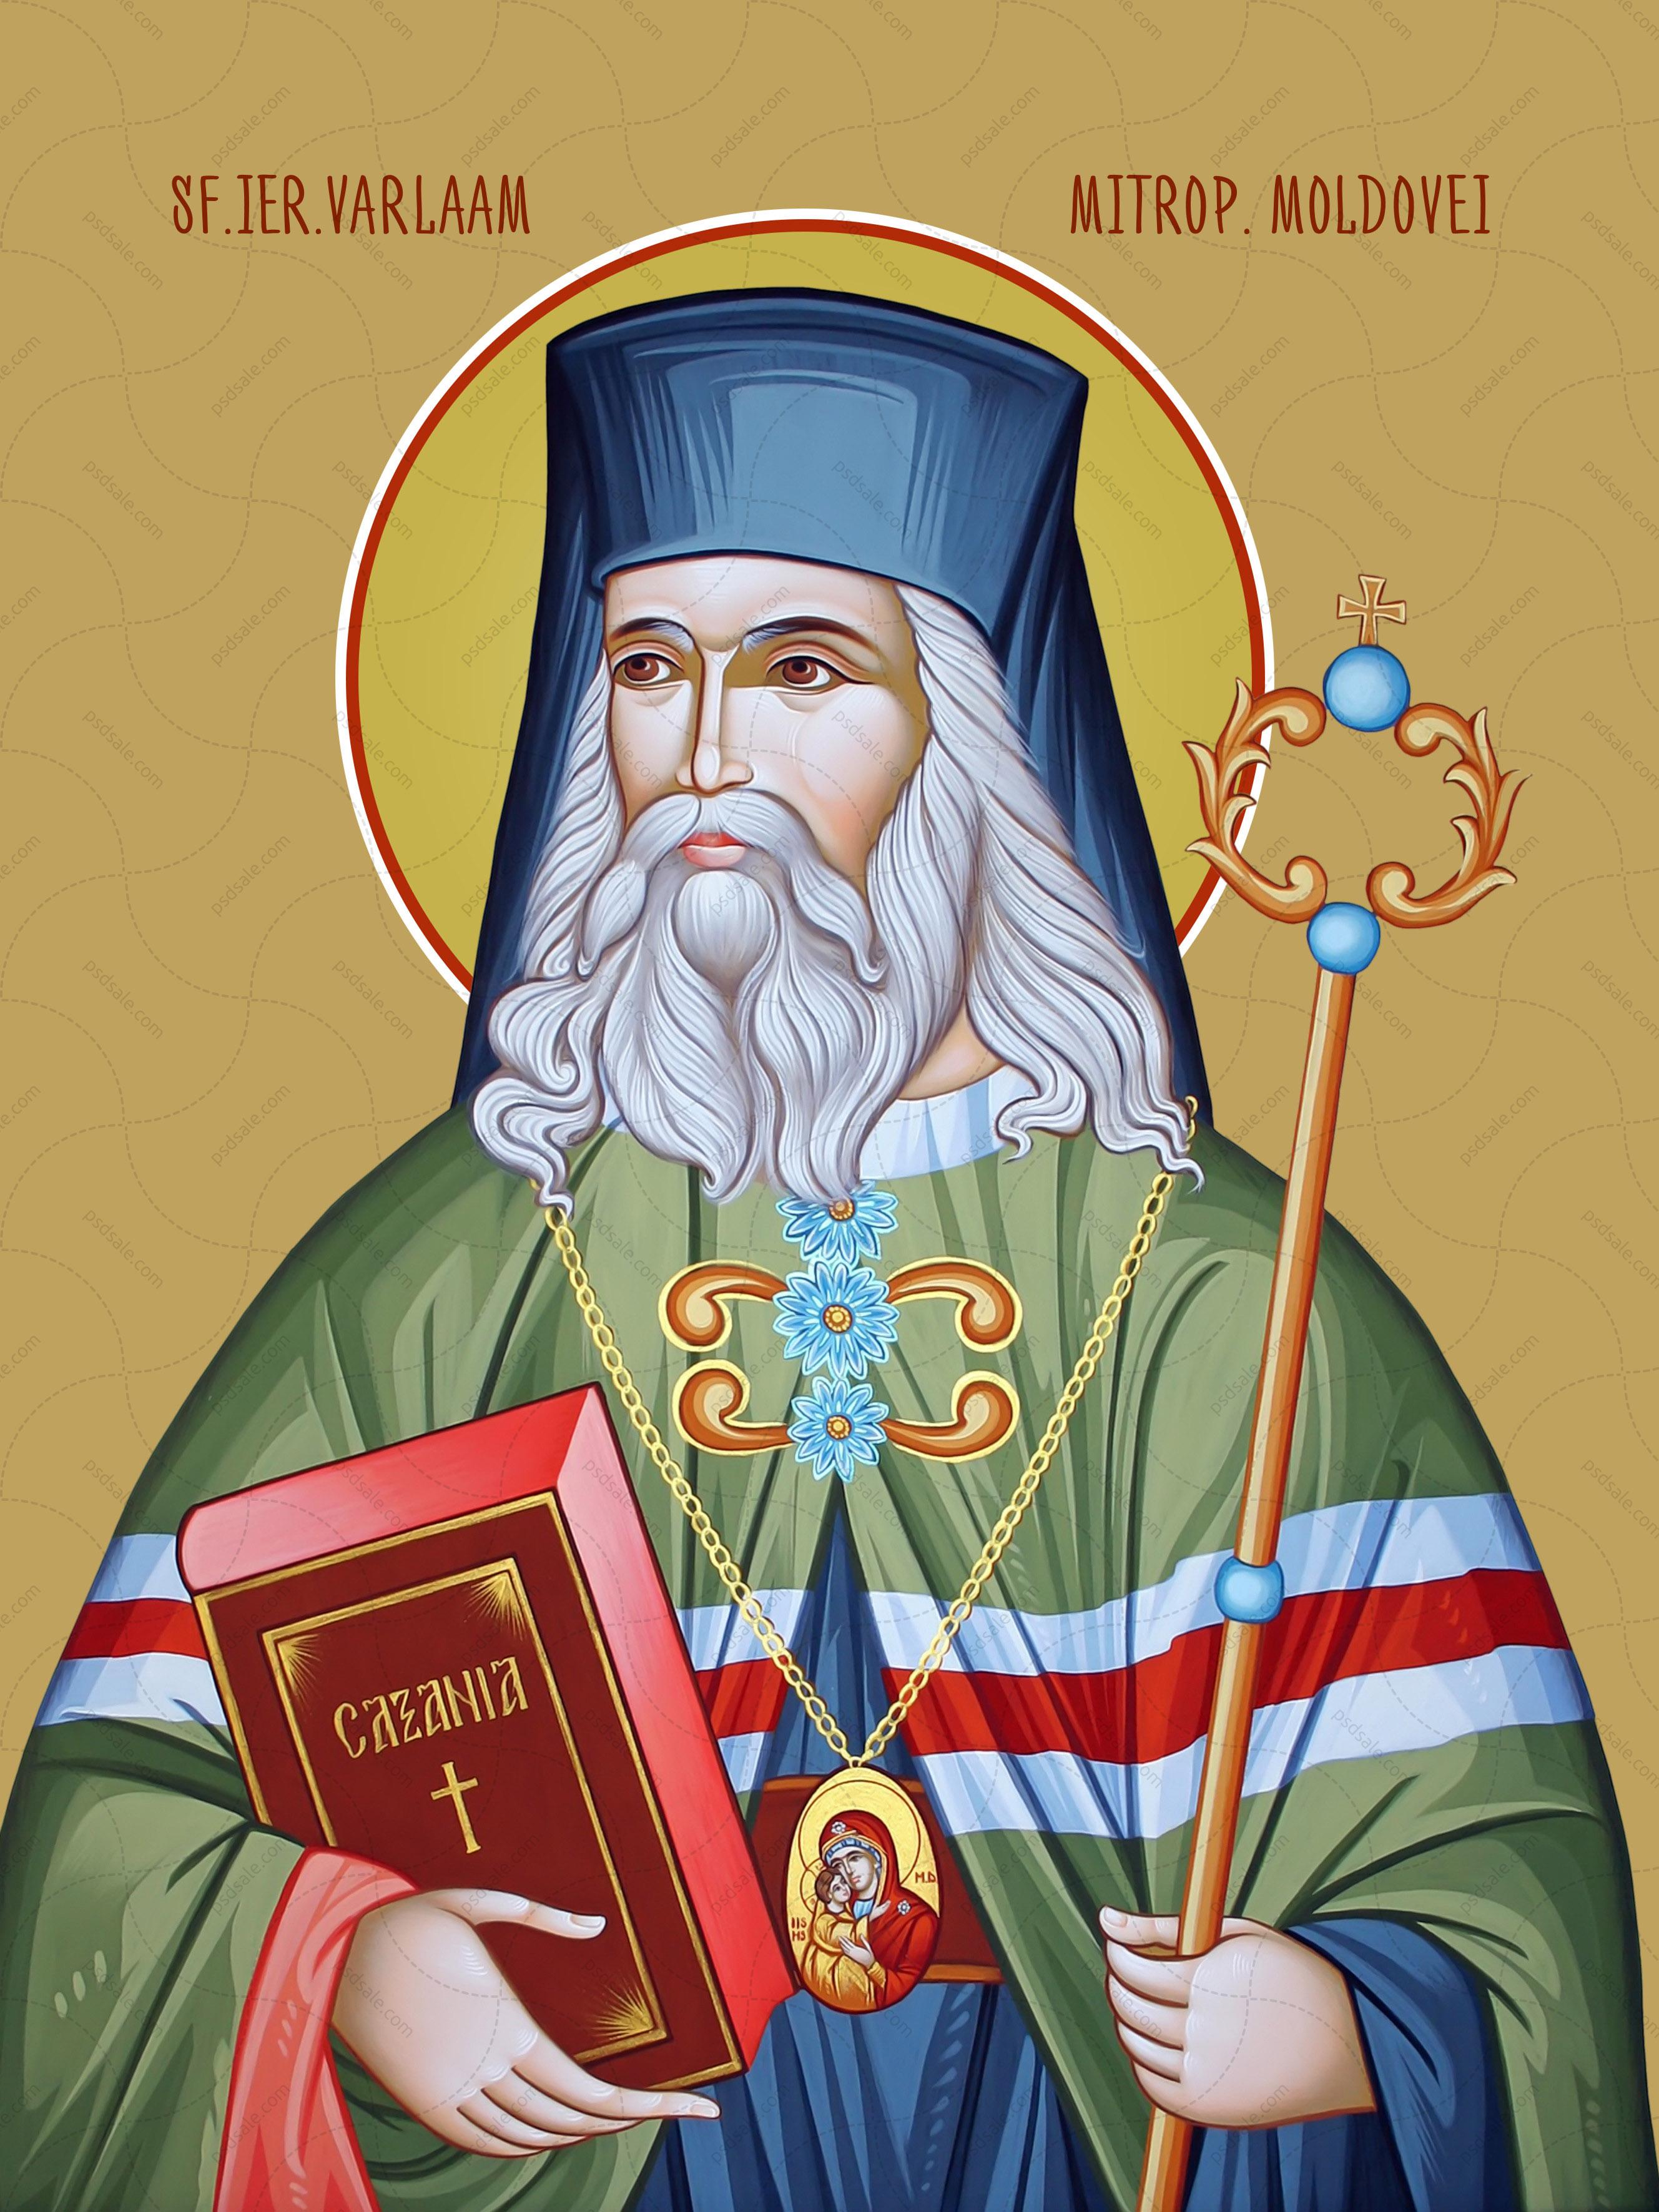 Варлаам / Sf. Varlaam, Mitropolitul Moldovei